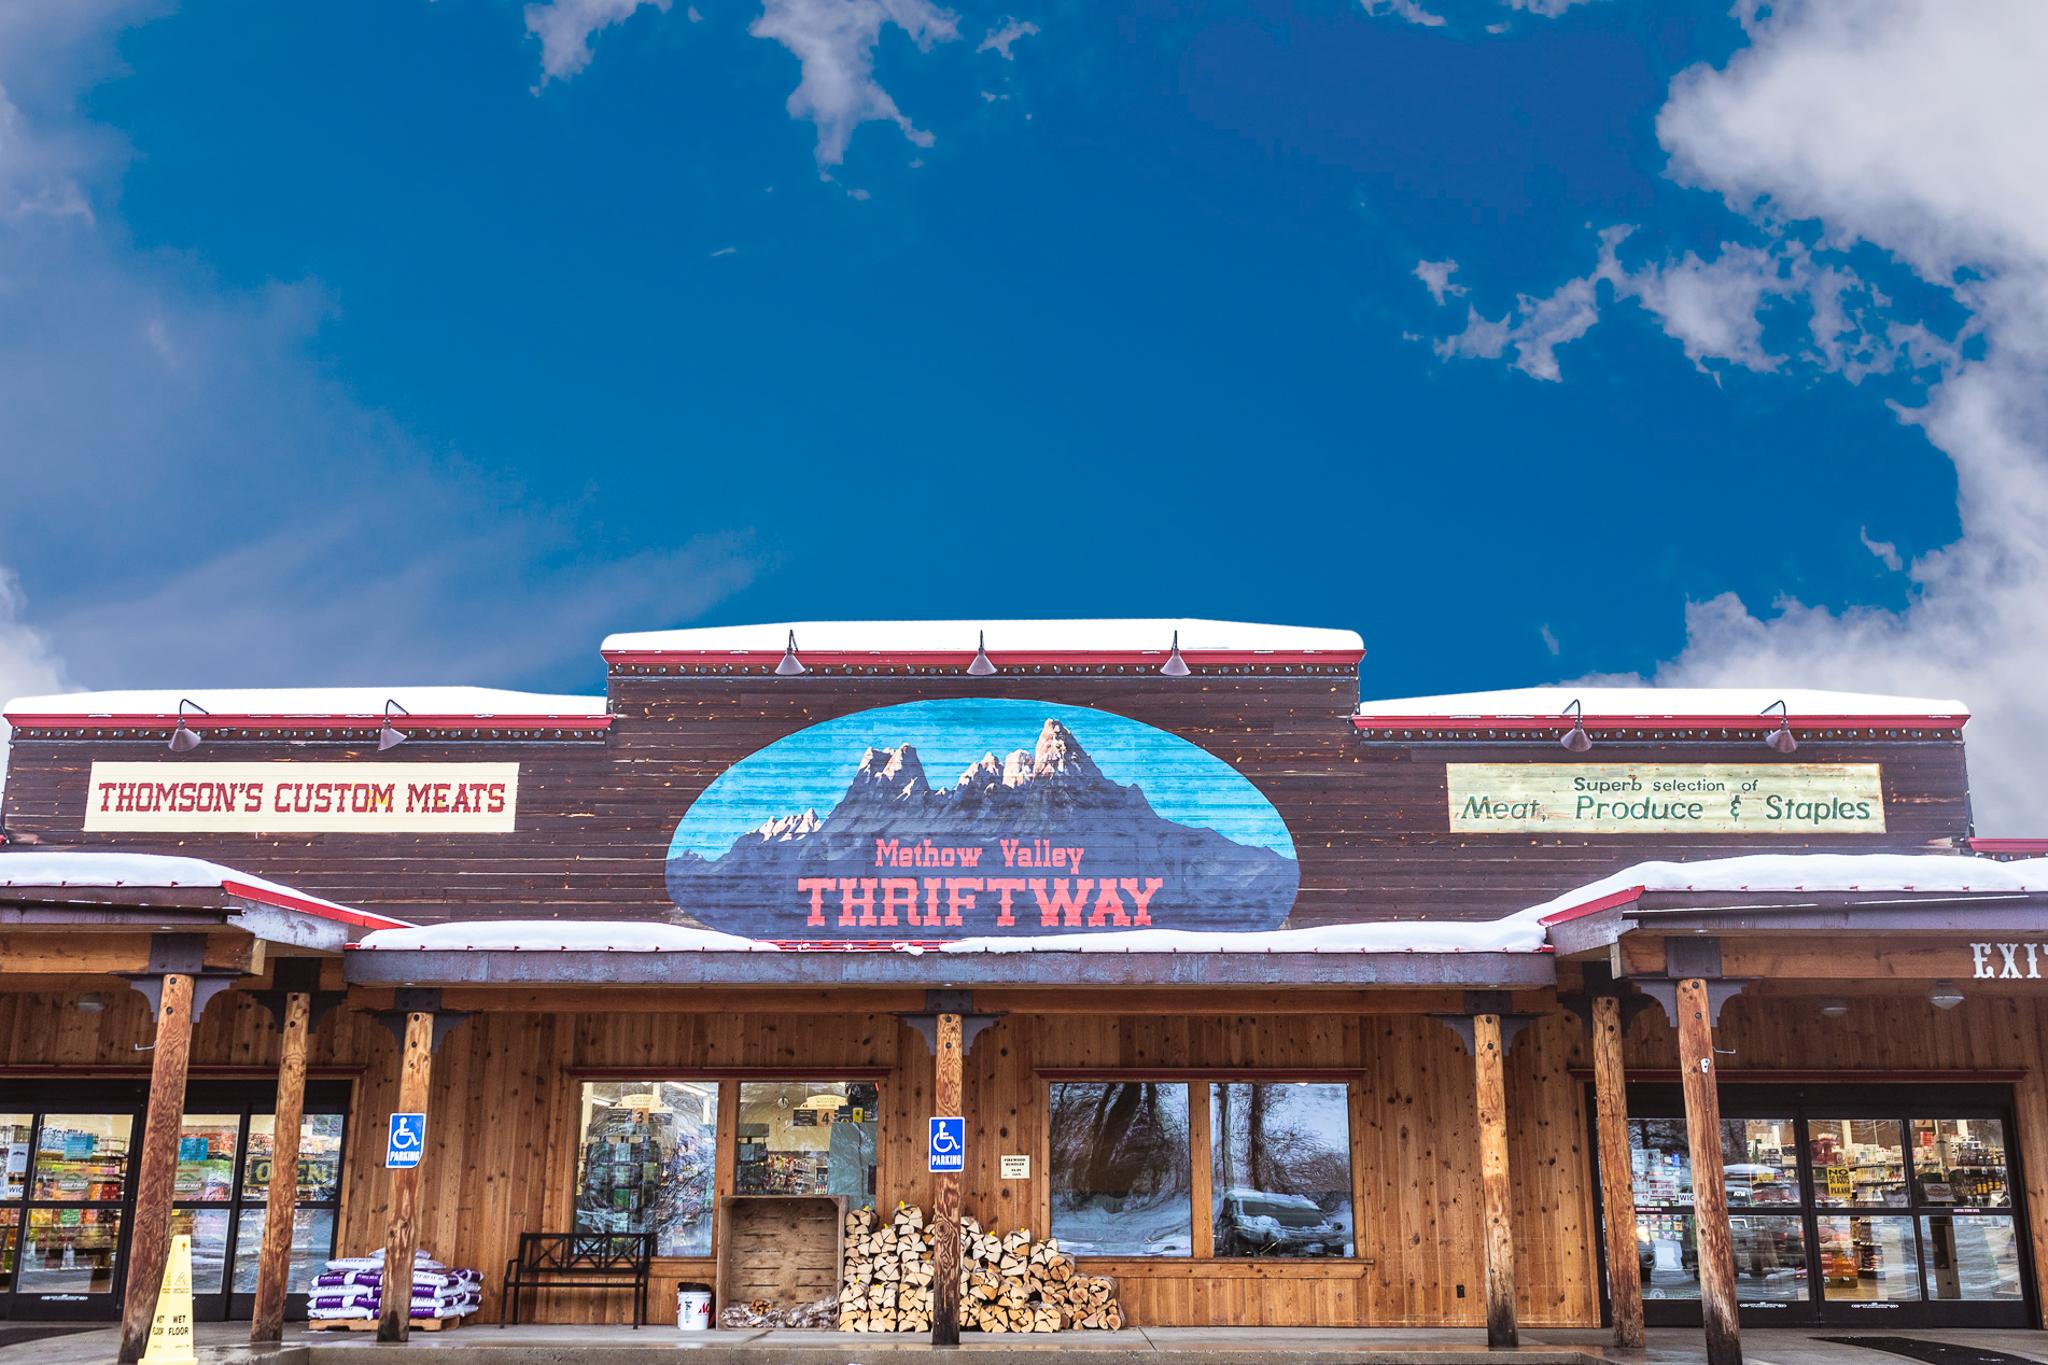 Methow Valley Thriftway Winthrop Washington